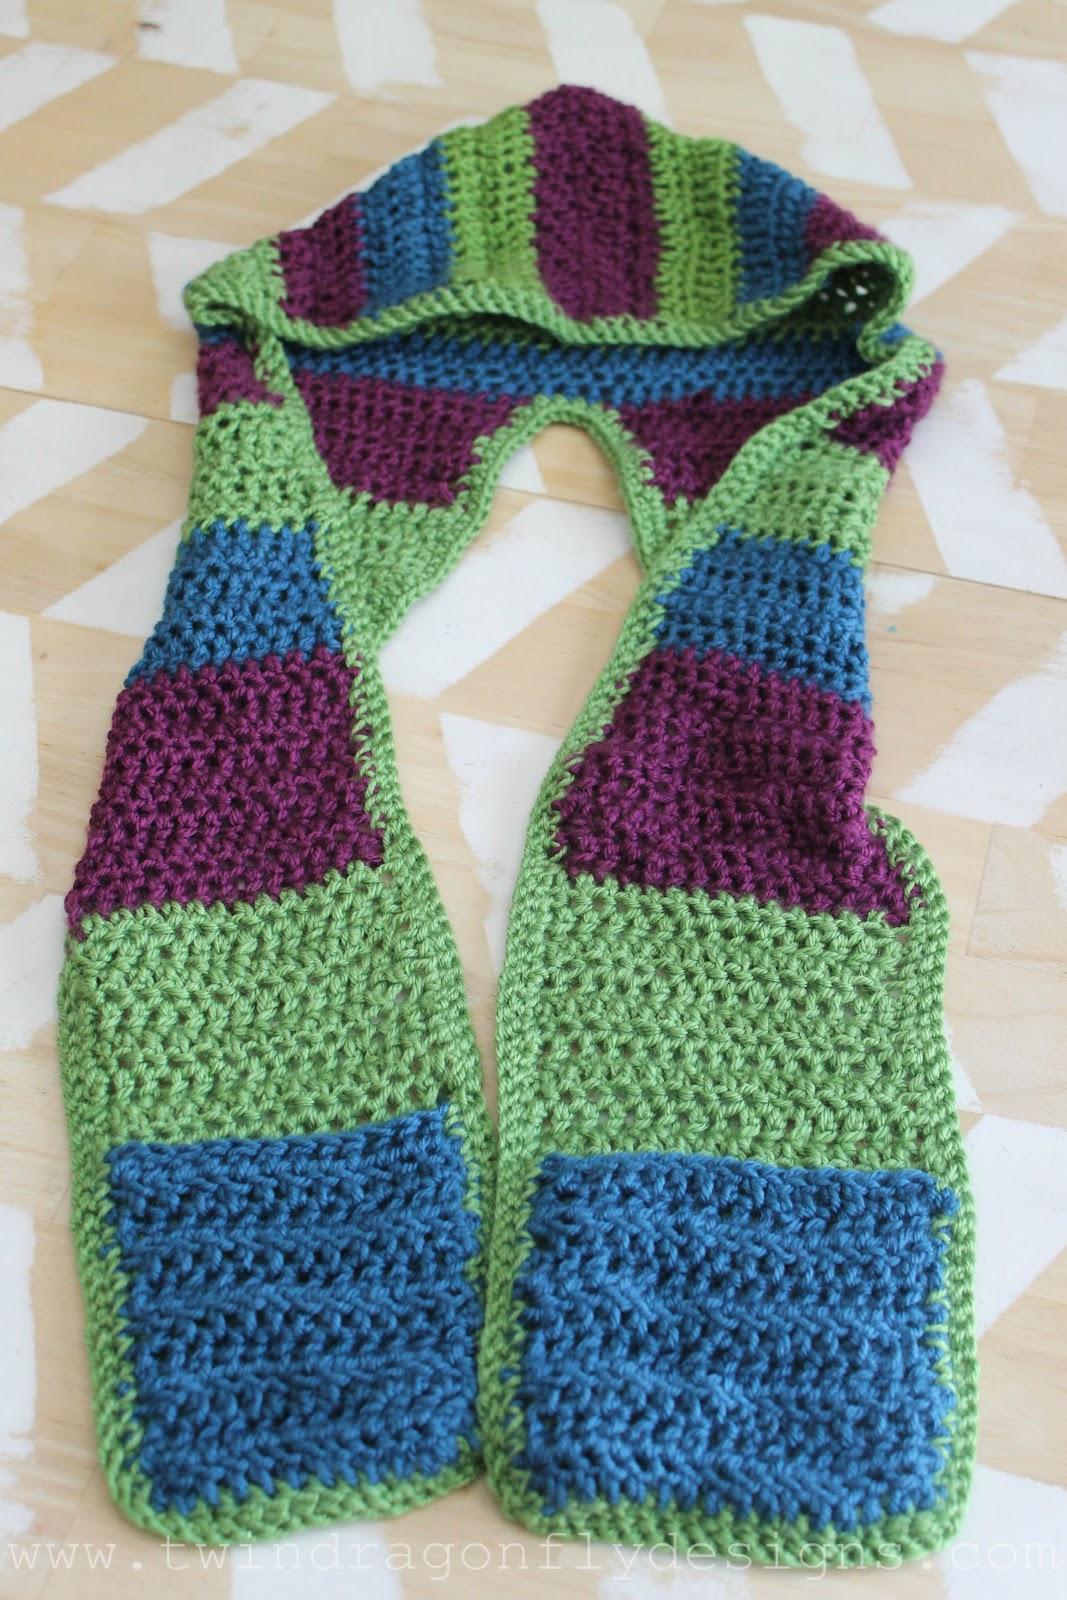 Crochet Hooded Scarf Pattern » Dragonfly Designs